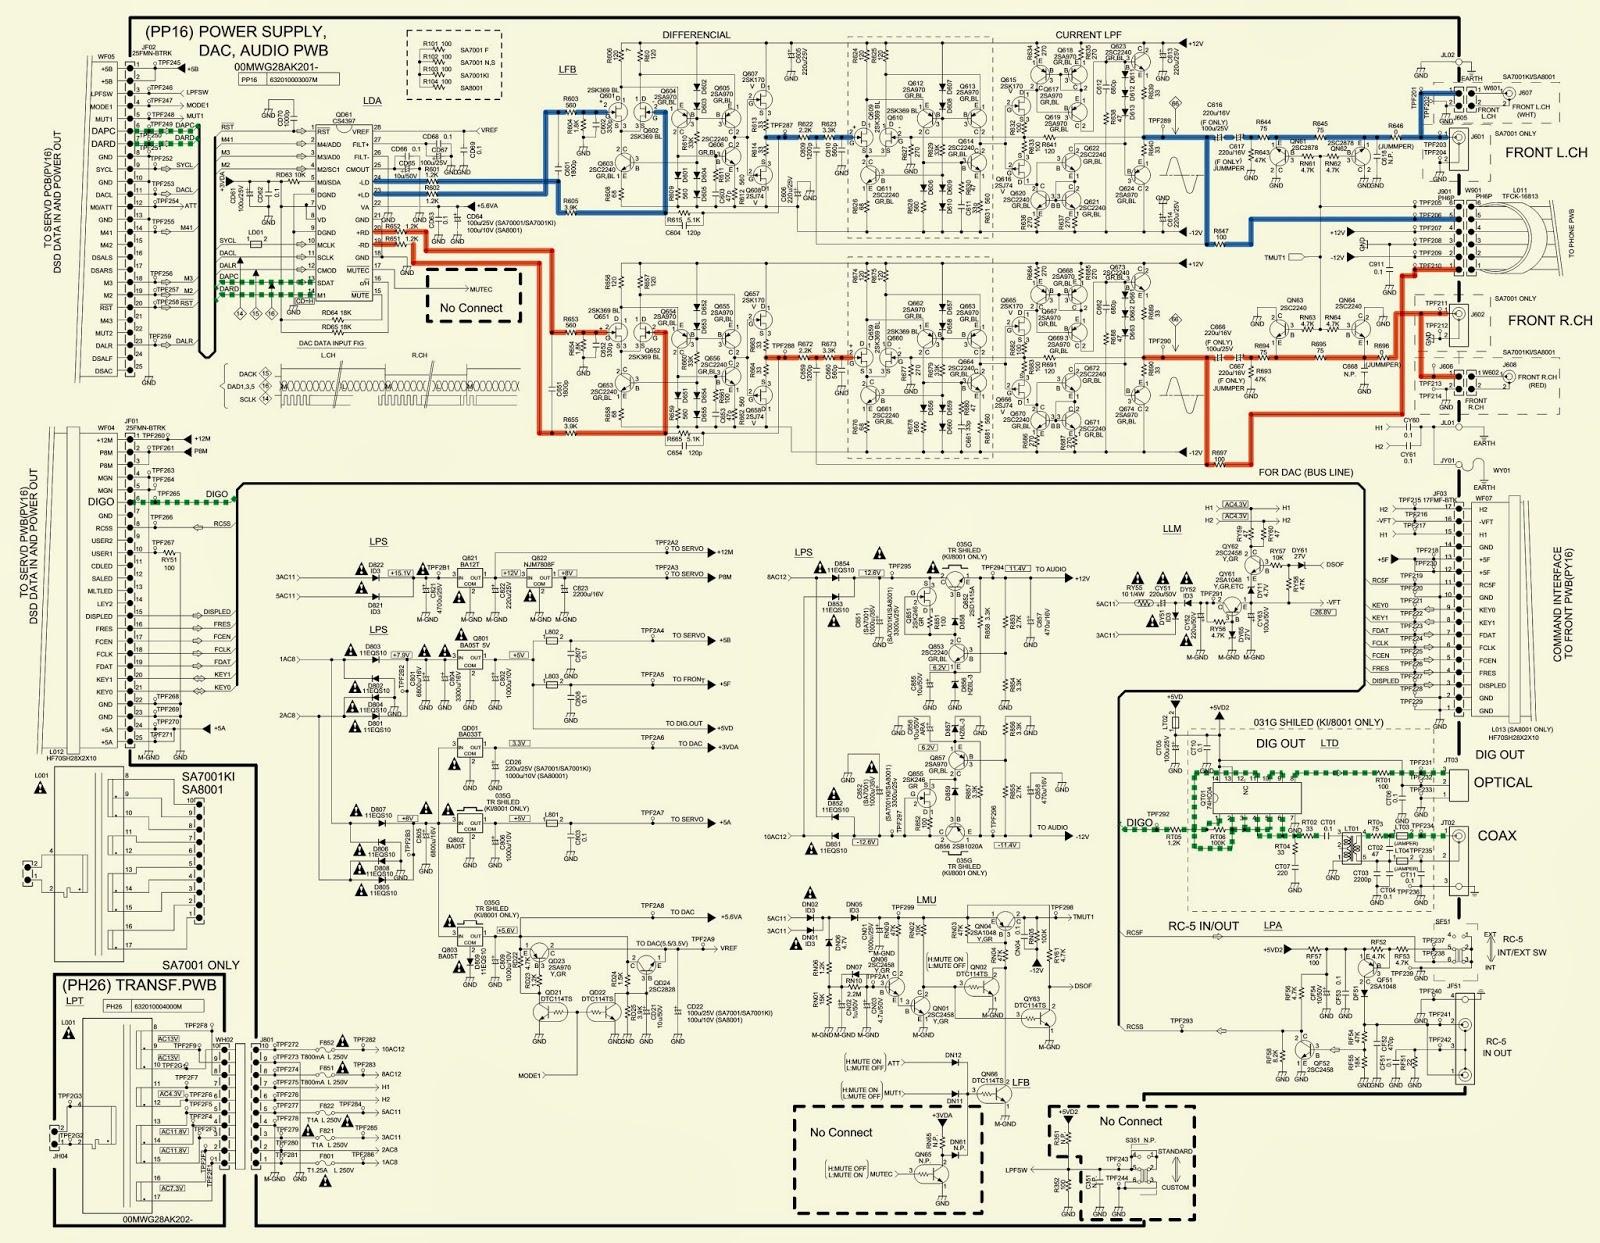 96 s10 wiring diagram cd player marantz - sa7001 - schematic - (circuit diagram) - super ... #4